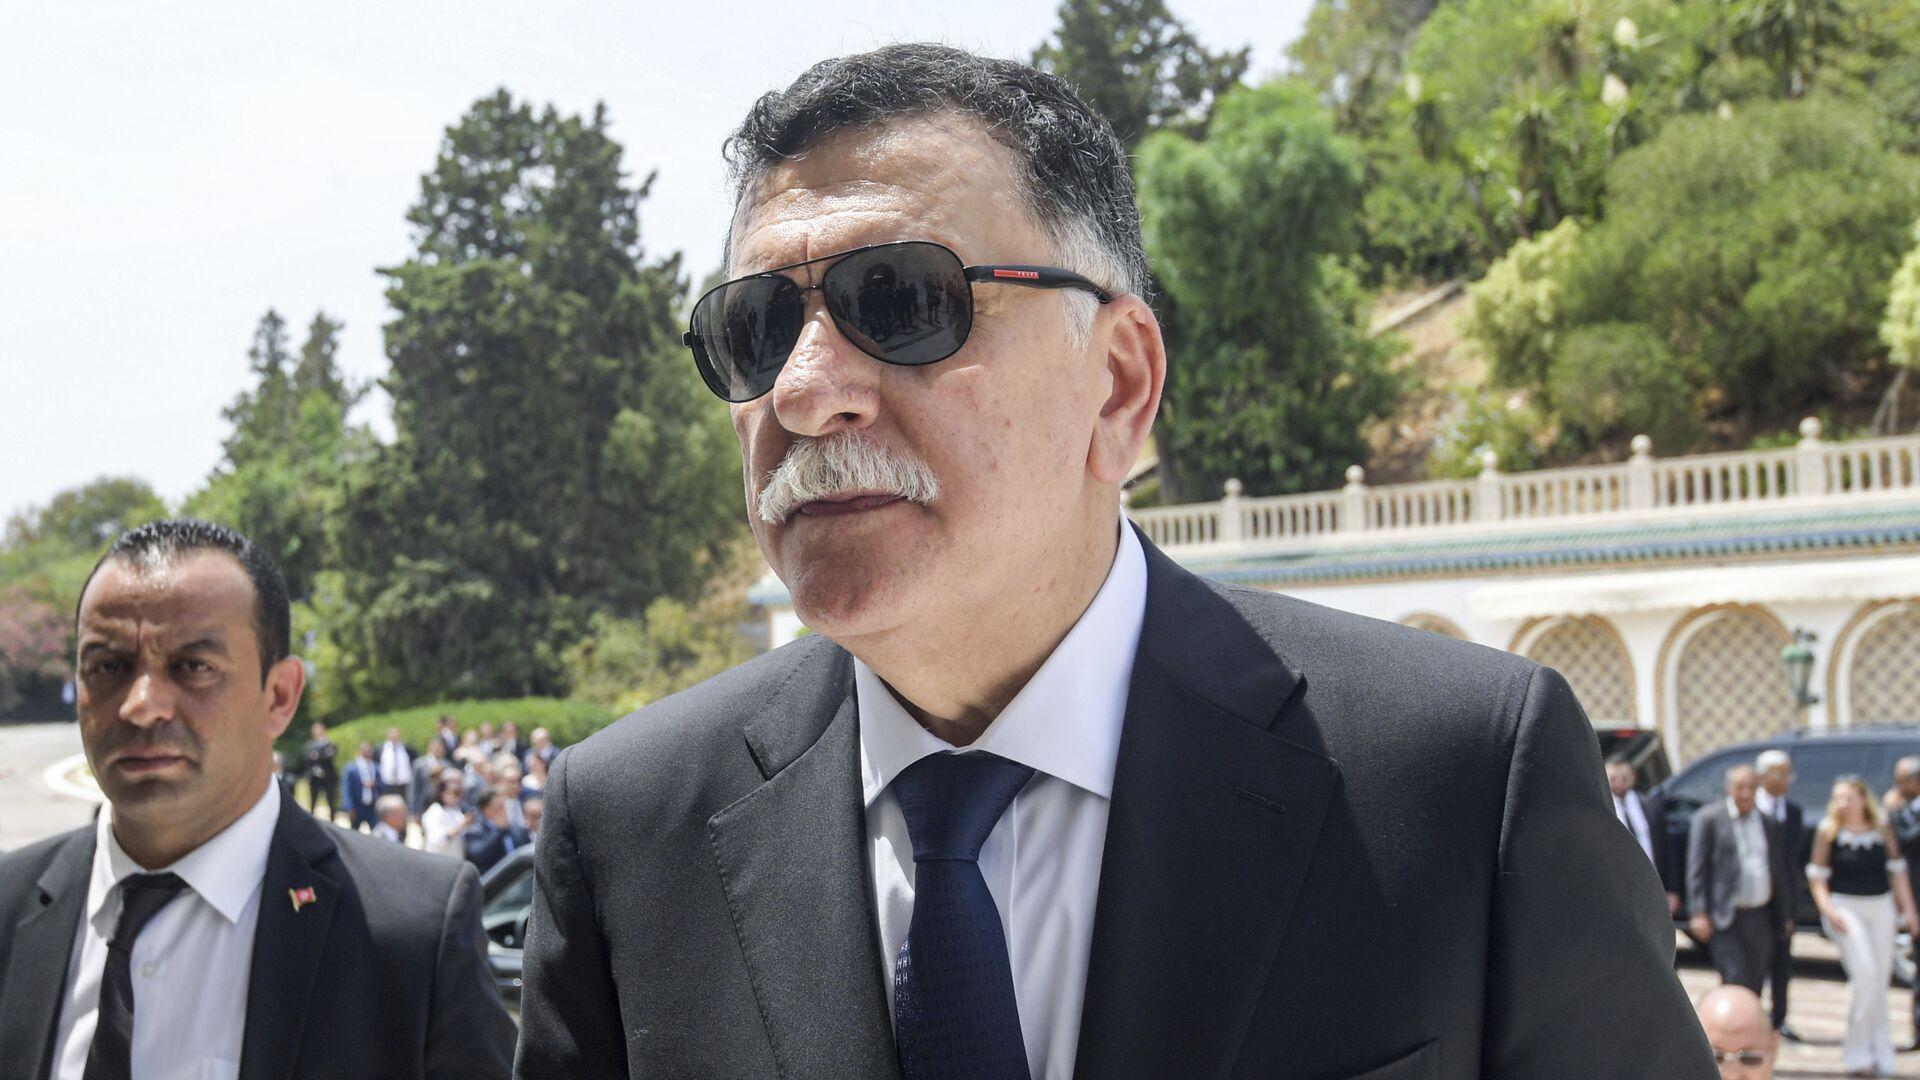 Fayez Sarraj, jefe del Gobierno de Acuerdo Nacional de Libia - Sputnik Mundo, 1920, 15.02.2021